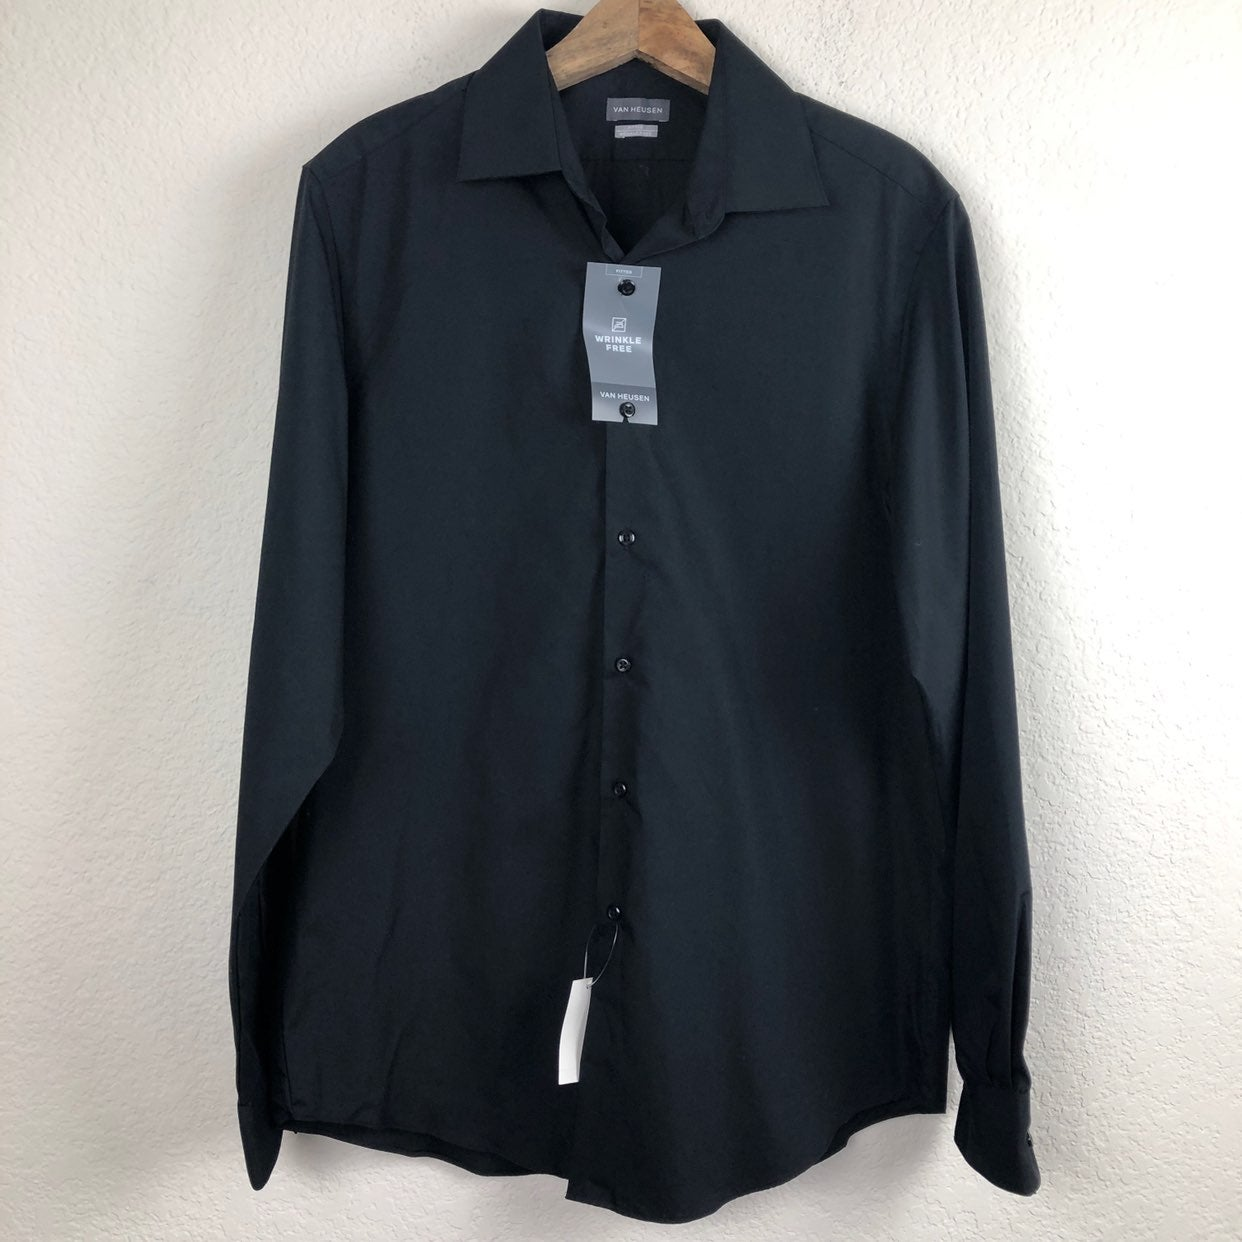 Van Heusen Wrinkle Free Fitted Shirt Med